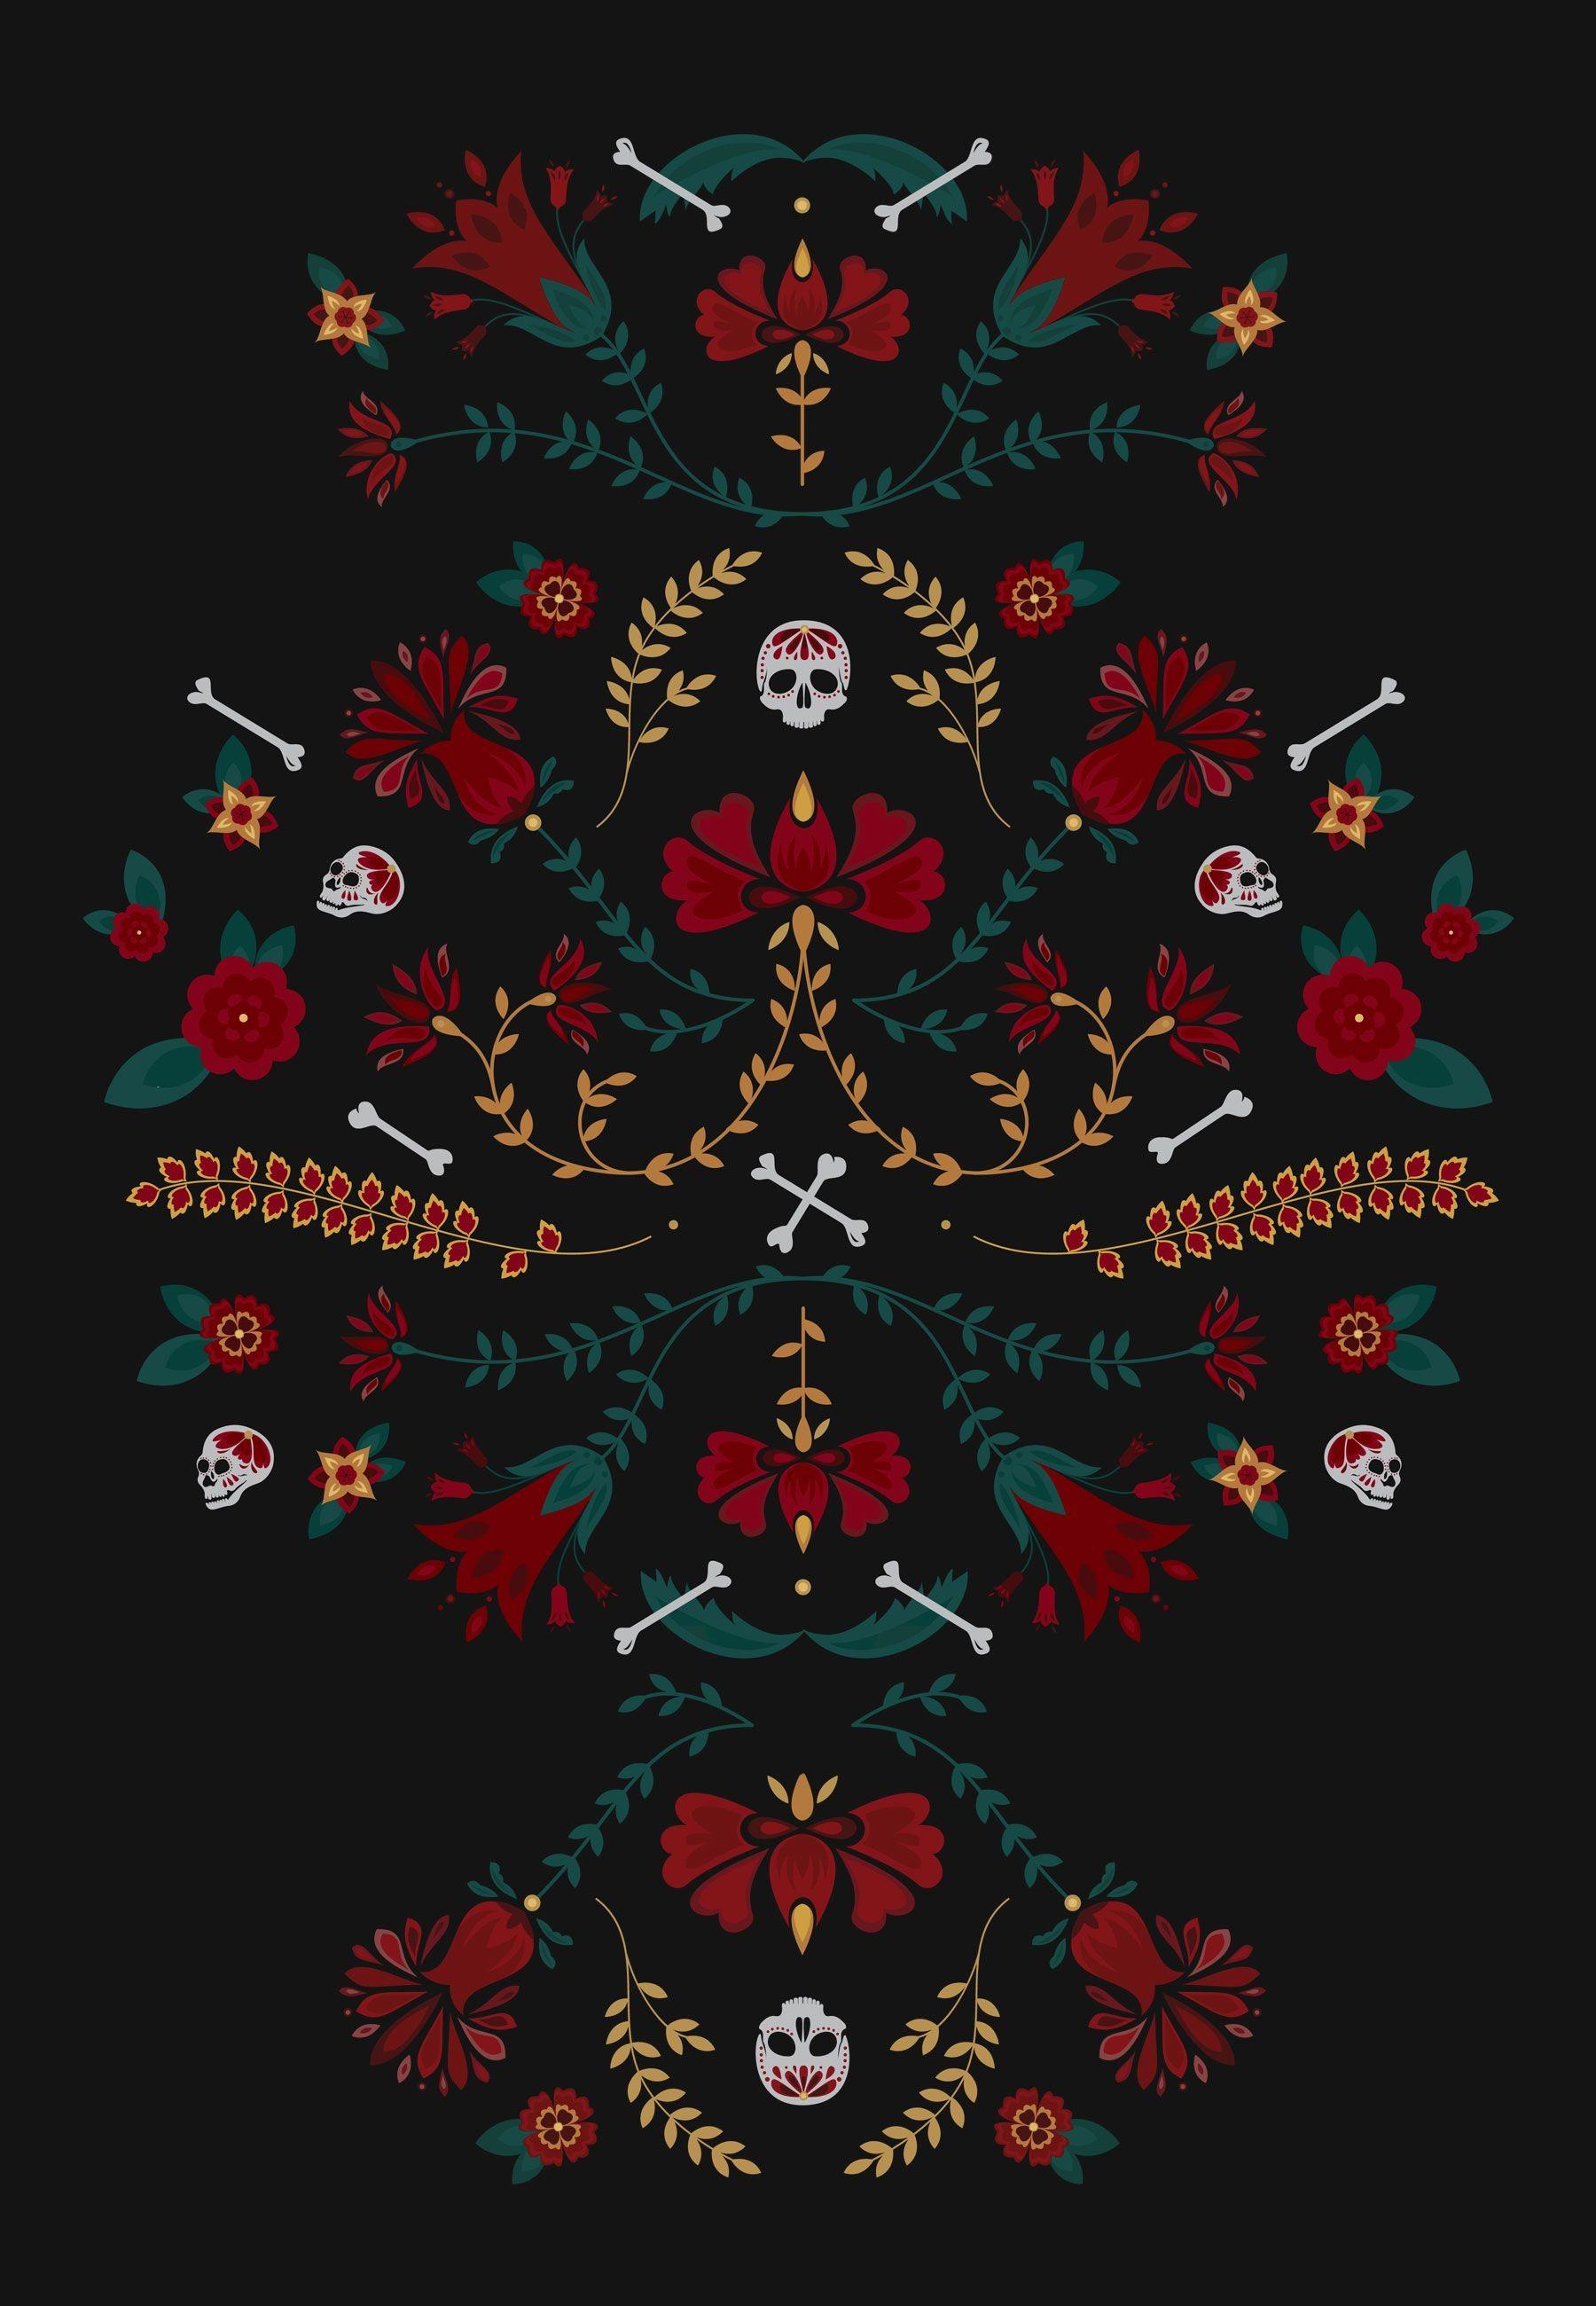 Halloween Skeleton Wallpaper.Sugar Skull Wallpaper For Iphone 62 Images